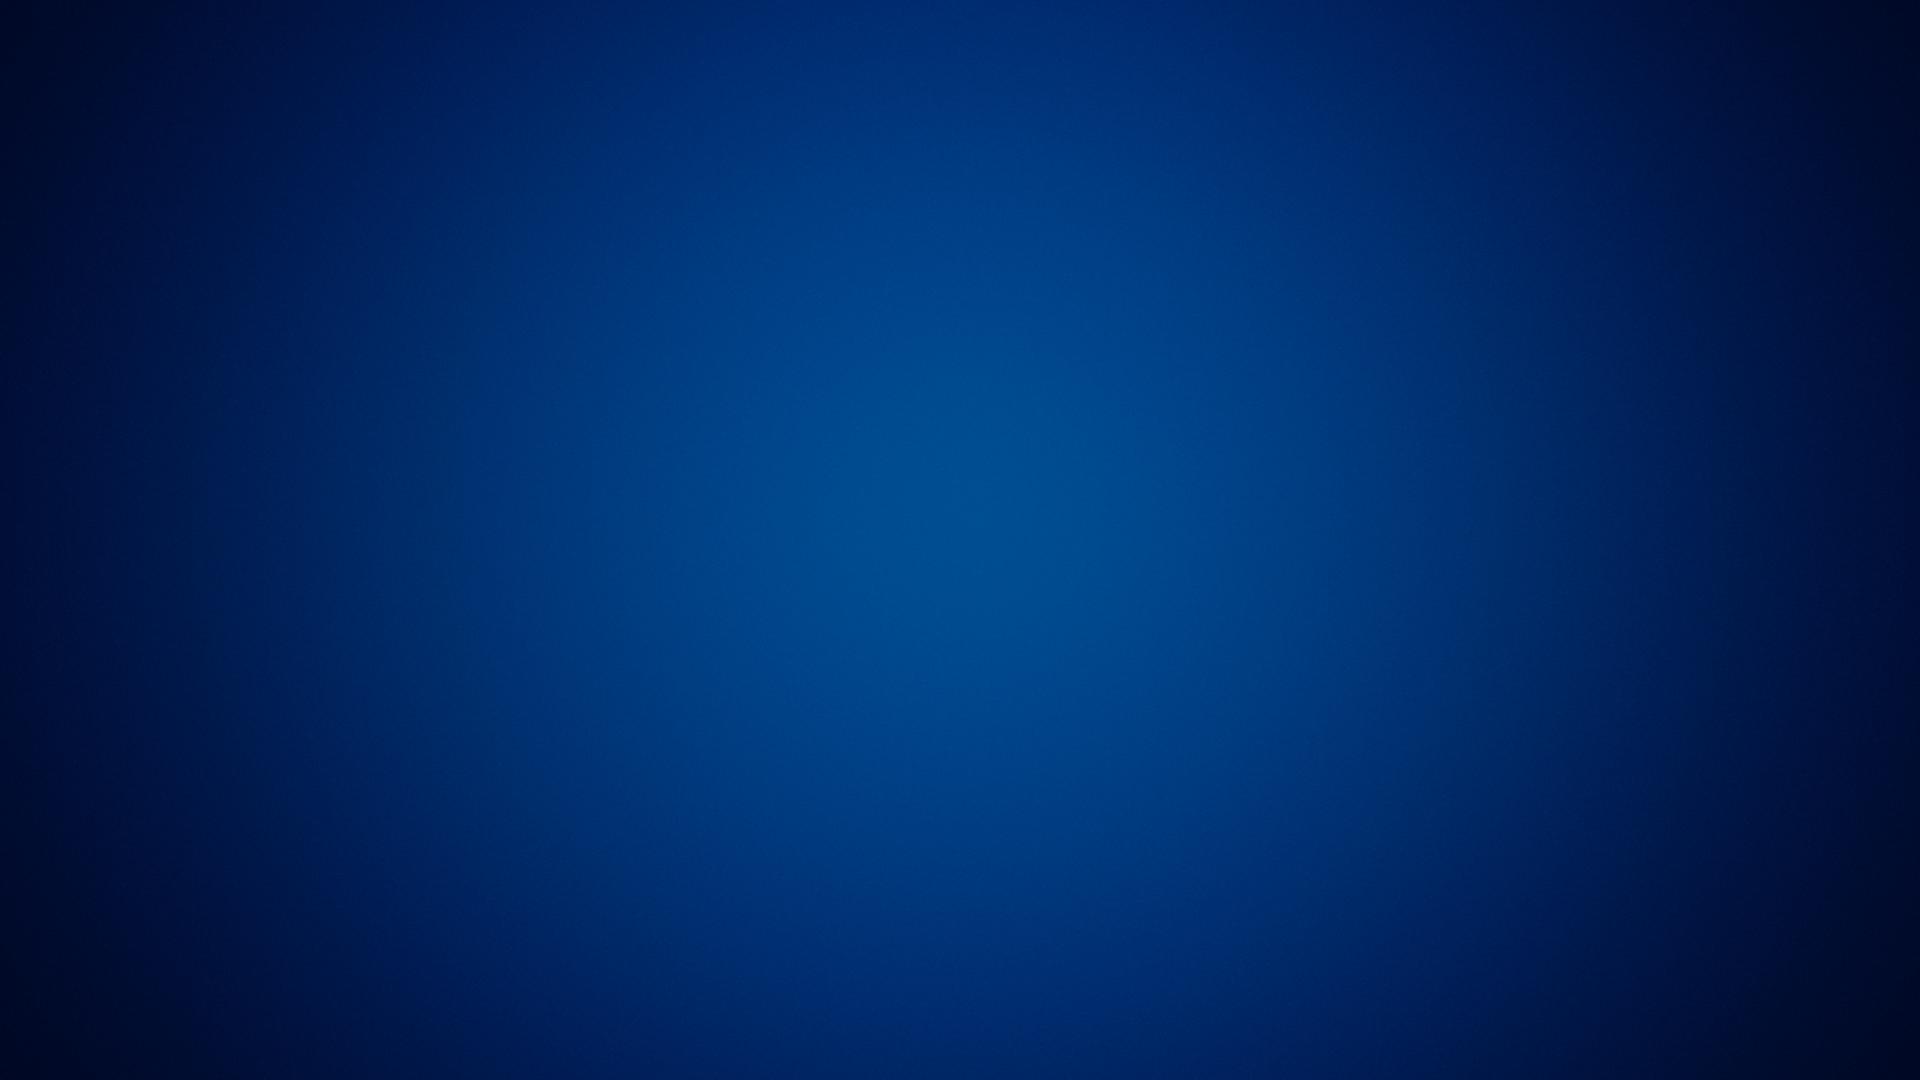 blue crayola superhero universe wikia fandom powered by wikia